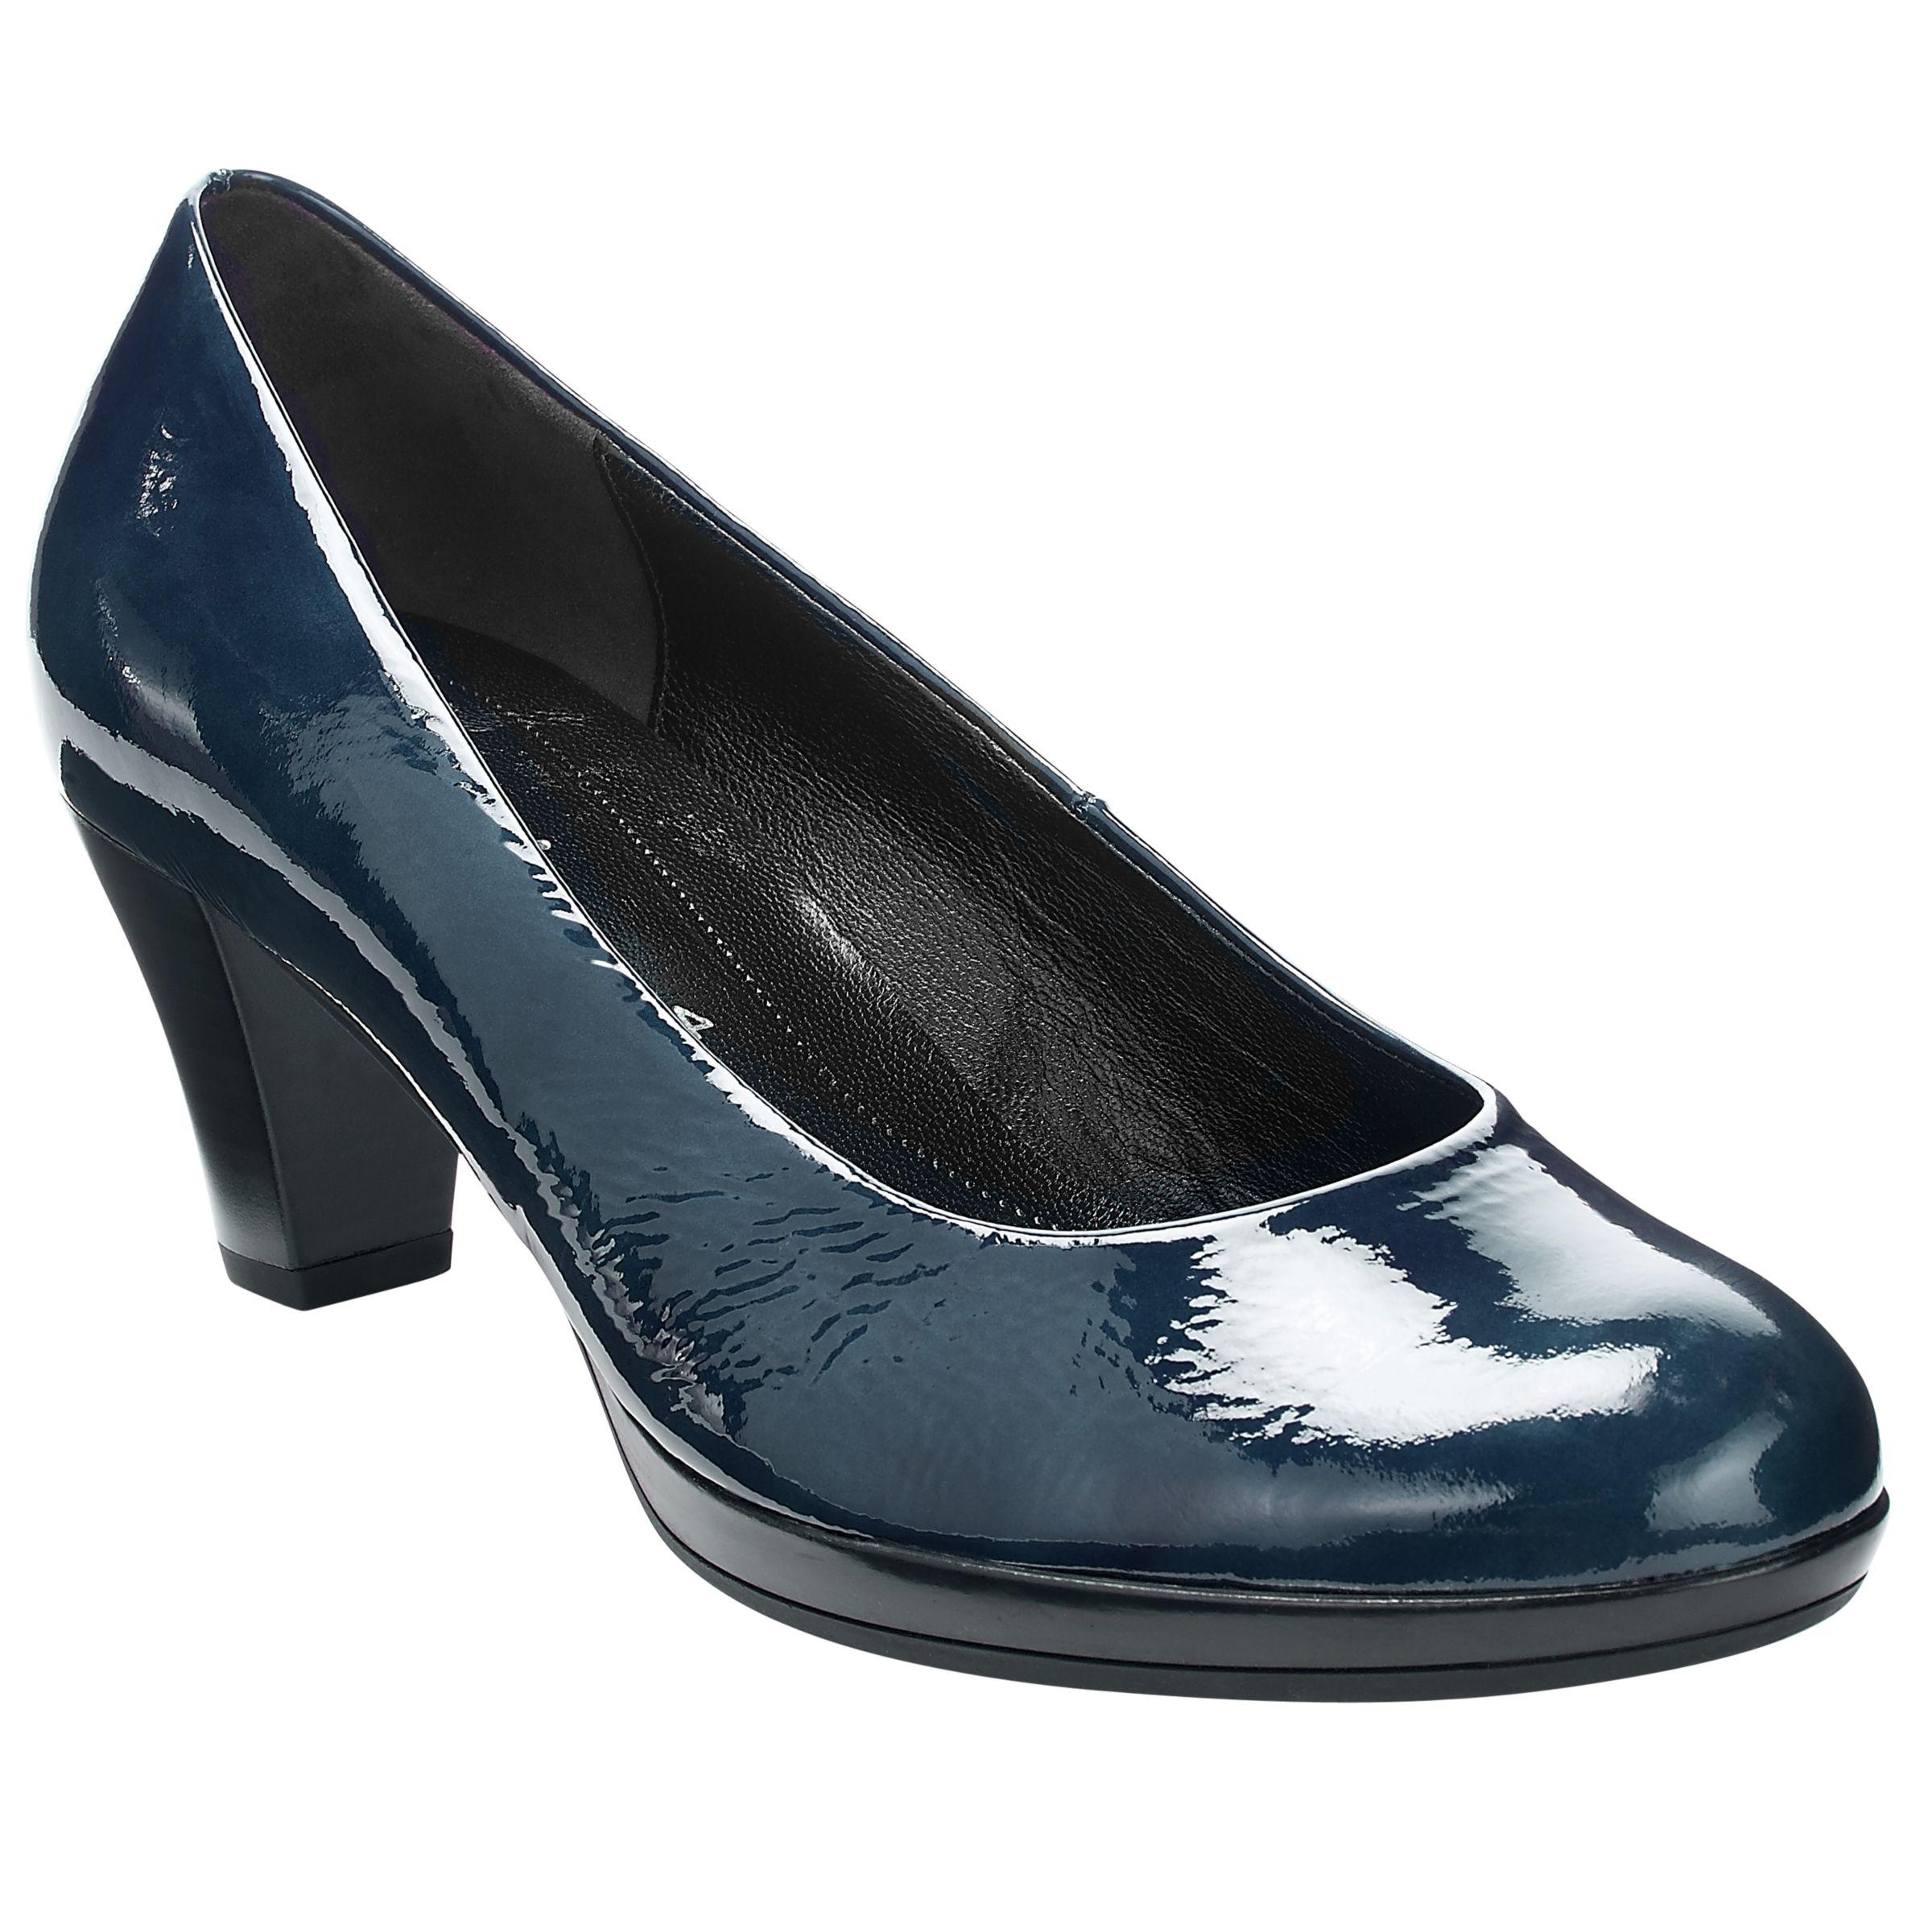 Gabor Rani Patent Platform Court Shoes, Navy